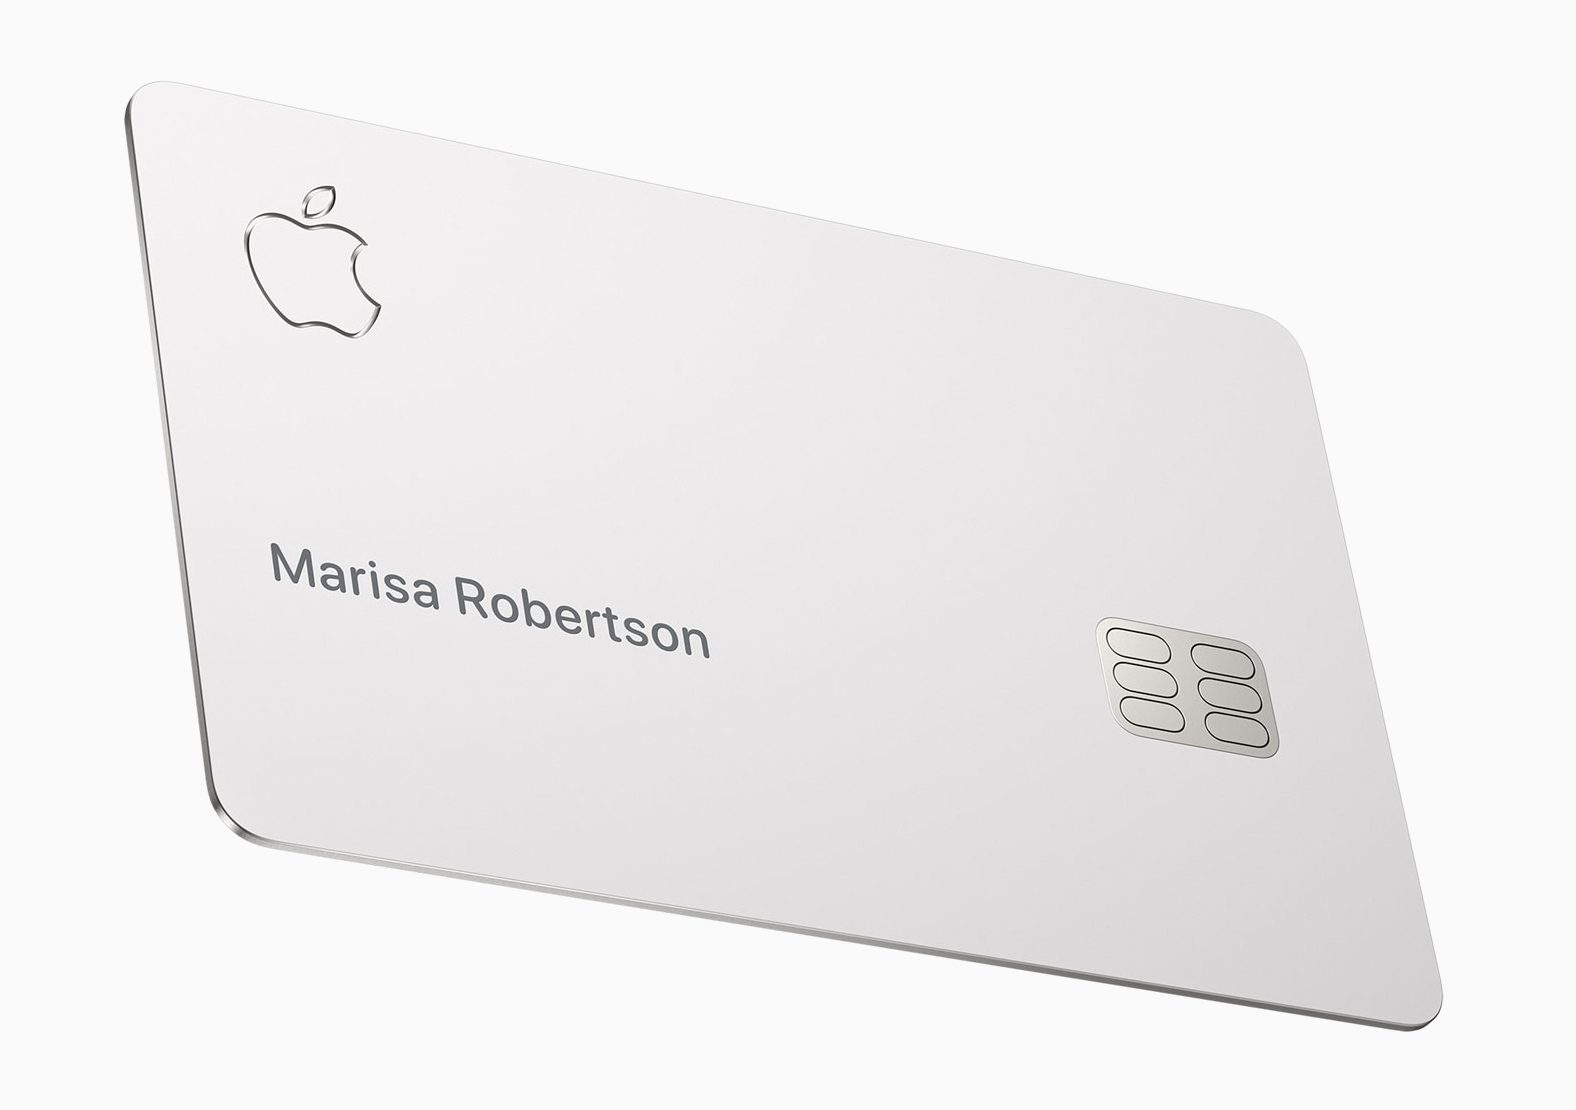 A Close Look at the Titanium Apple Card's Design